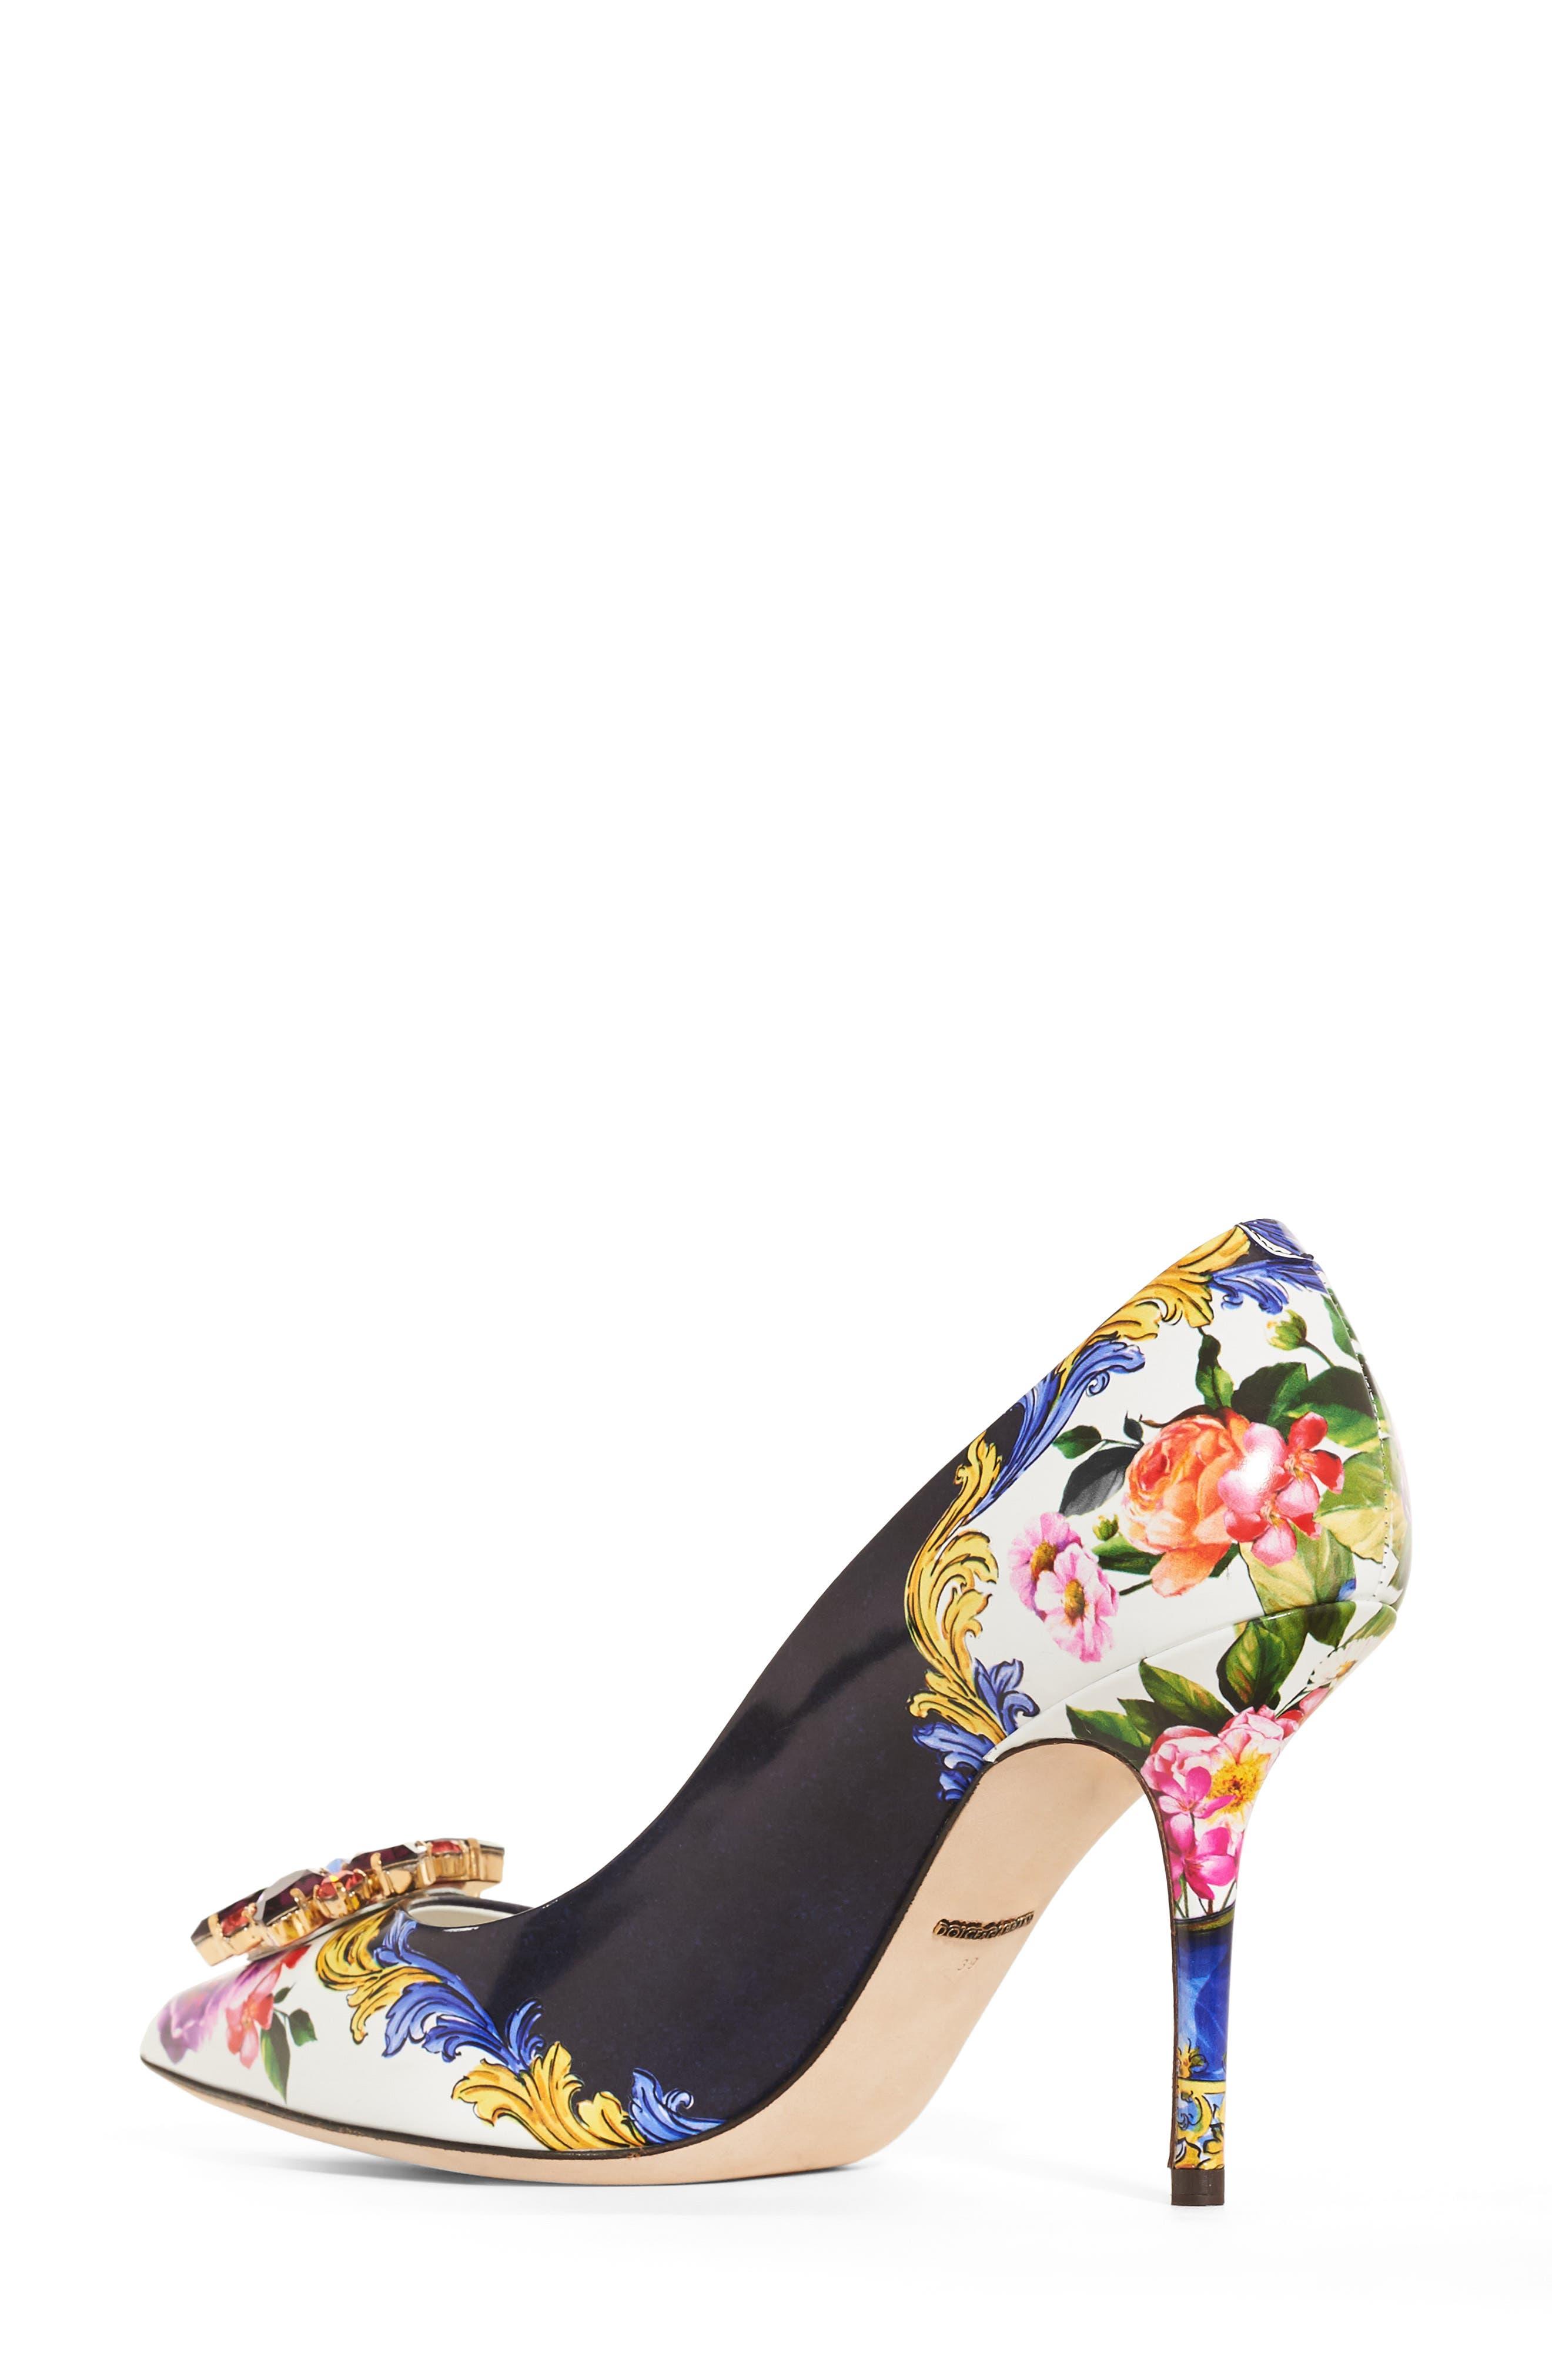 Dolce & Gabbana Print Pump,                             Alternate thumbnail 2, color,                             Navy/ White Floral